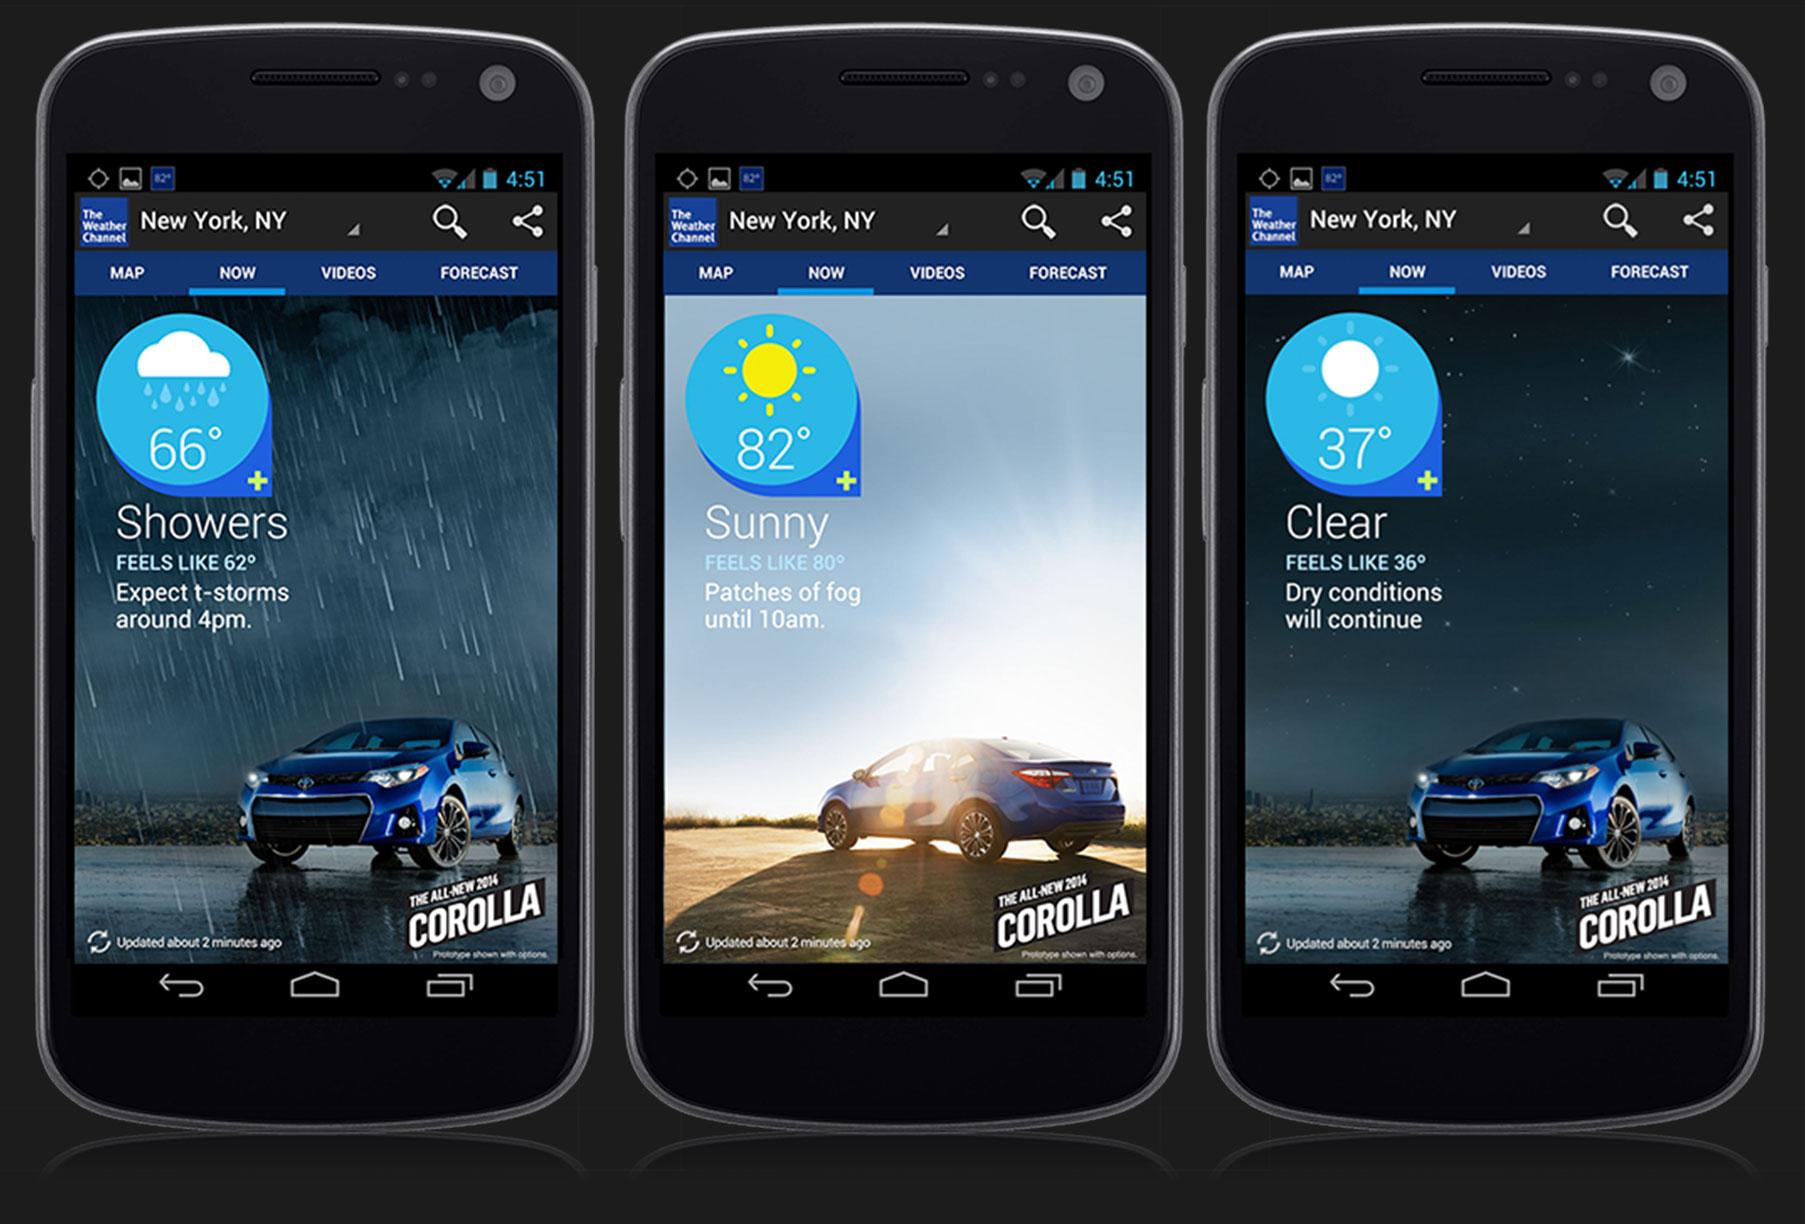 Toyota Corolla Android App Brand Integration